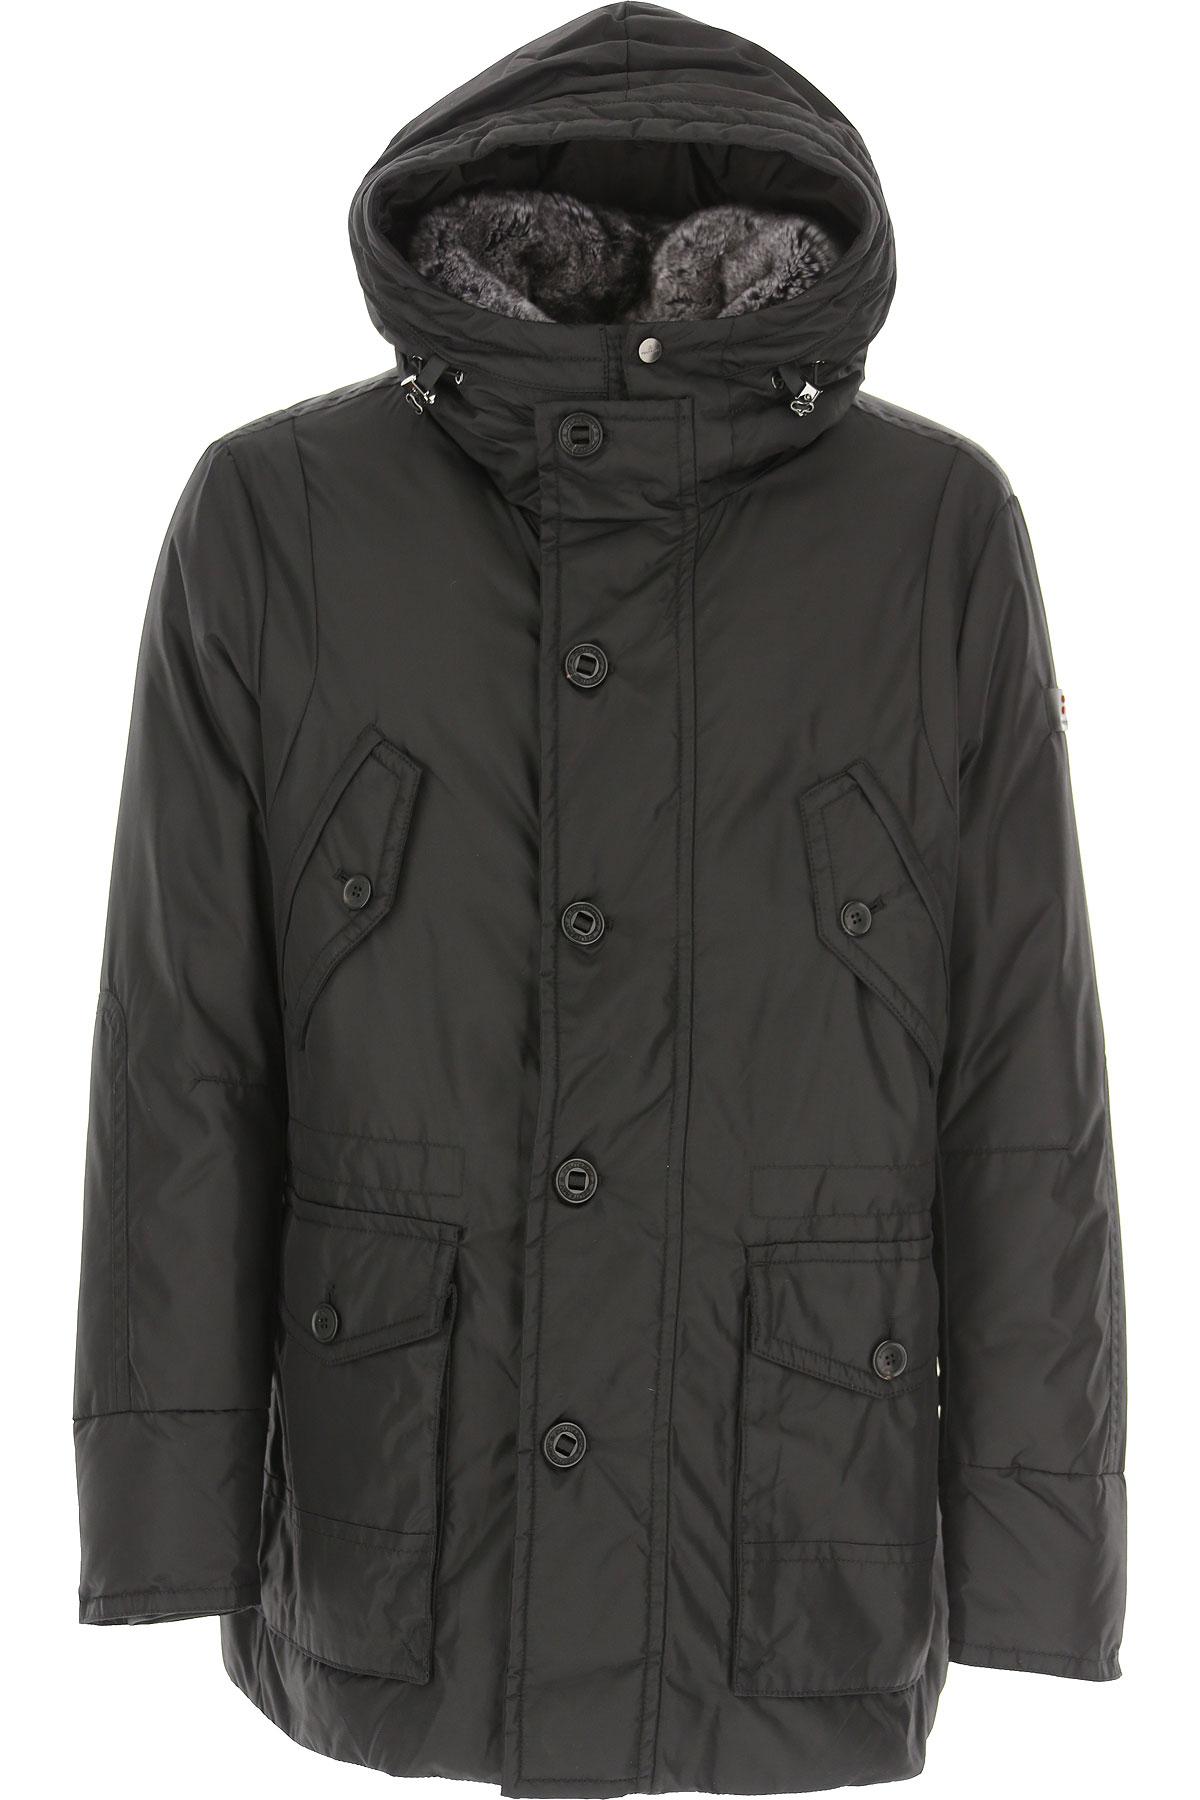 Peuterey Down Jacket for Men, Puffer Ski Jacket On Sale, Black, Down, 2019, S XL